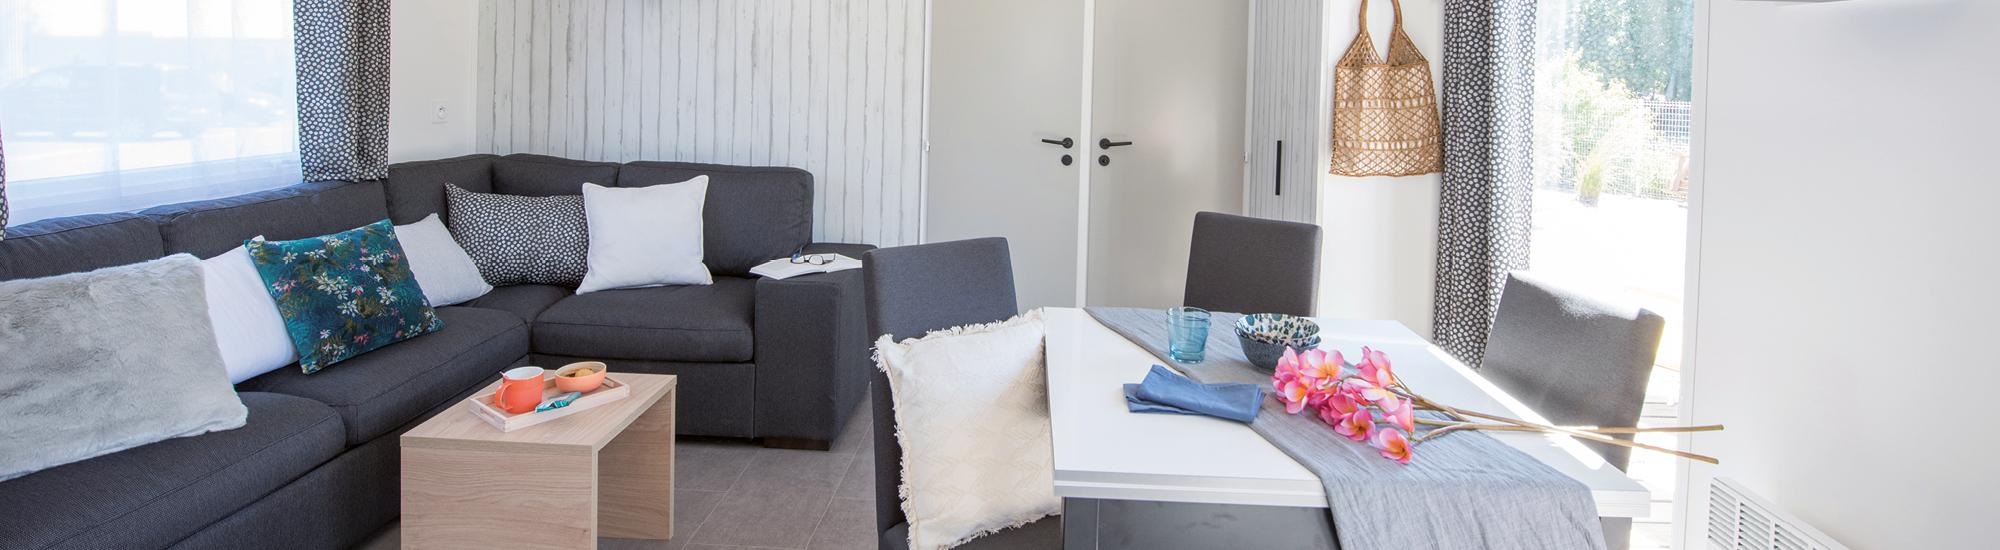 mobil homes r sidentiels 2 chambres kaledaduo mobil home. Black Bedroom Furniture Sets. Home Design Ideas